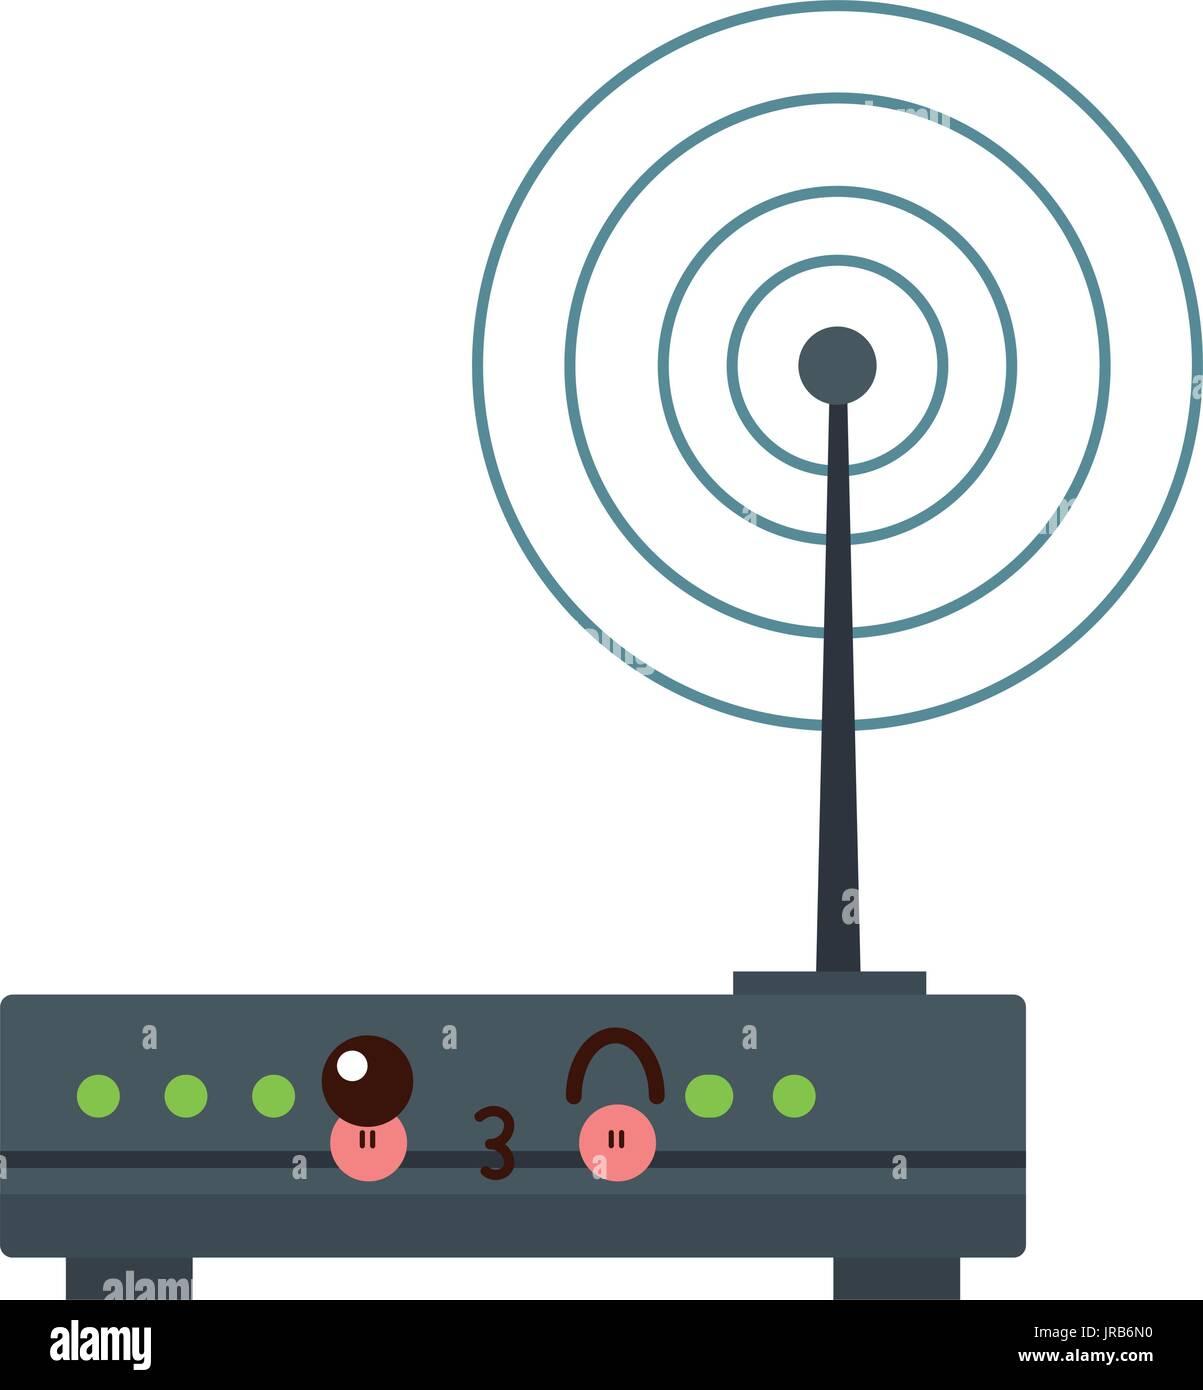 kawaii wireless network router switch modern digital broadband - Stock Image